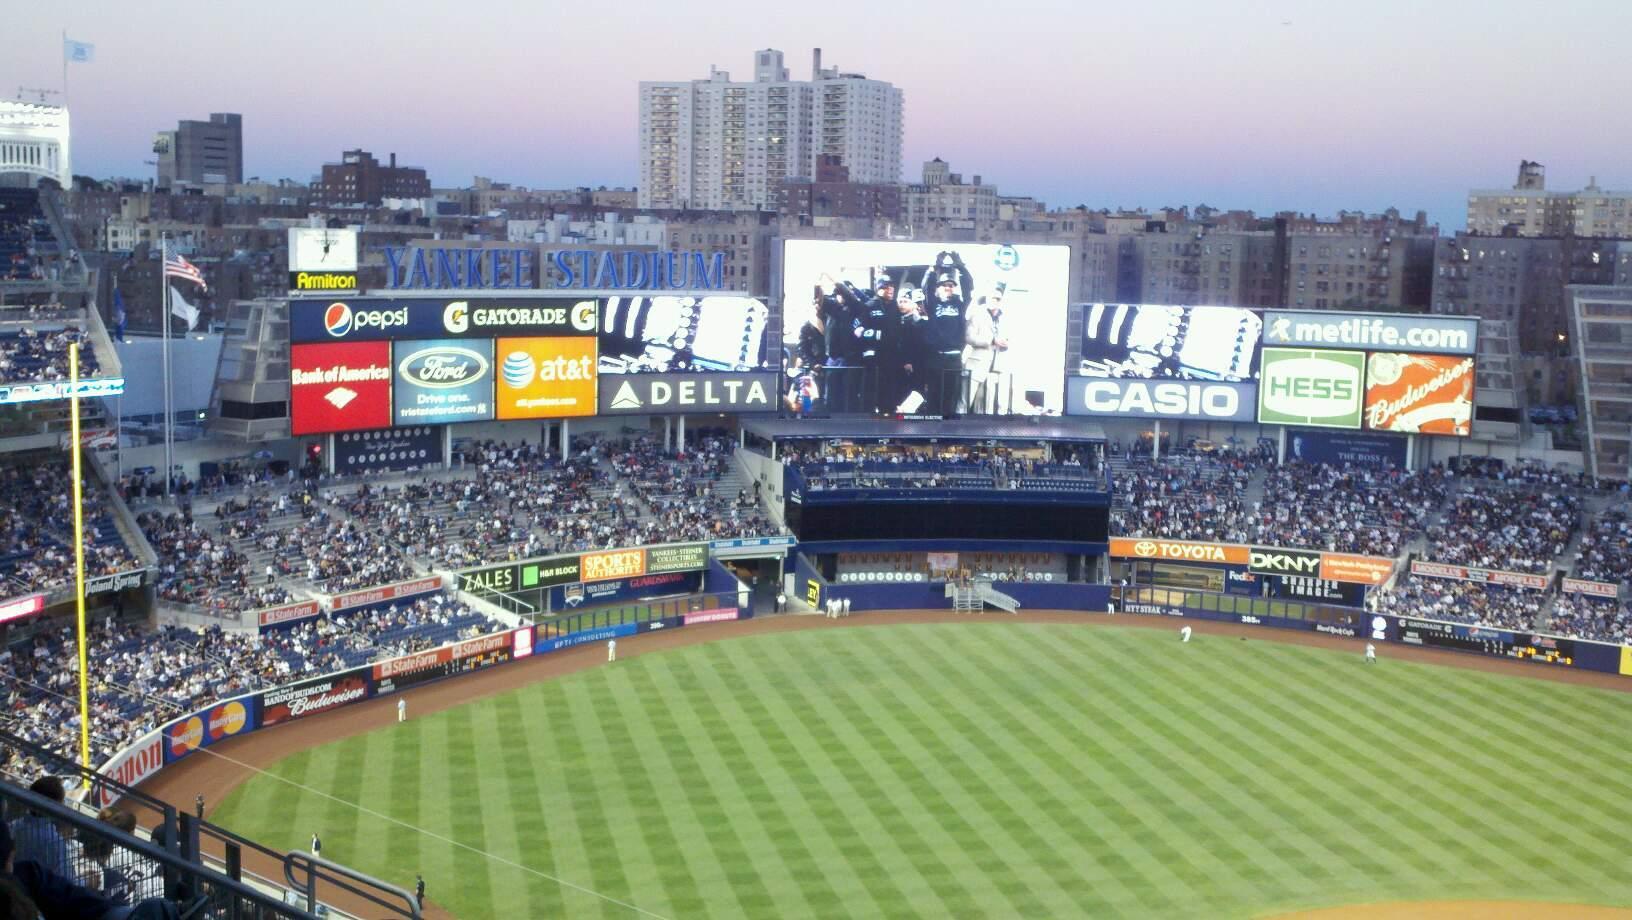 Yankee Stadium Vak 422 Rij 5 Stoel 20